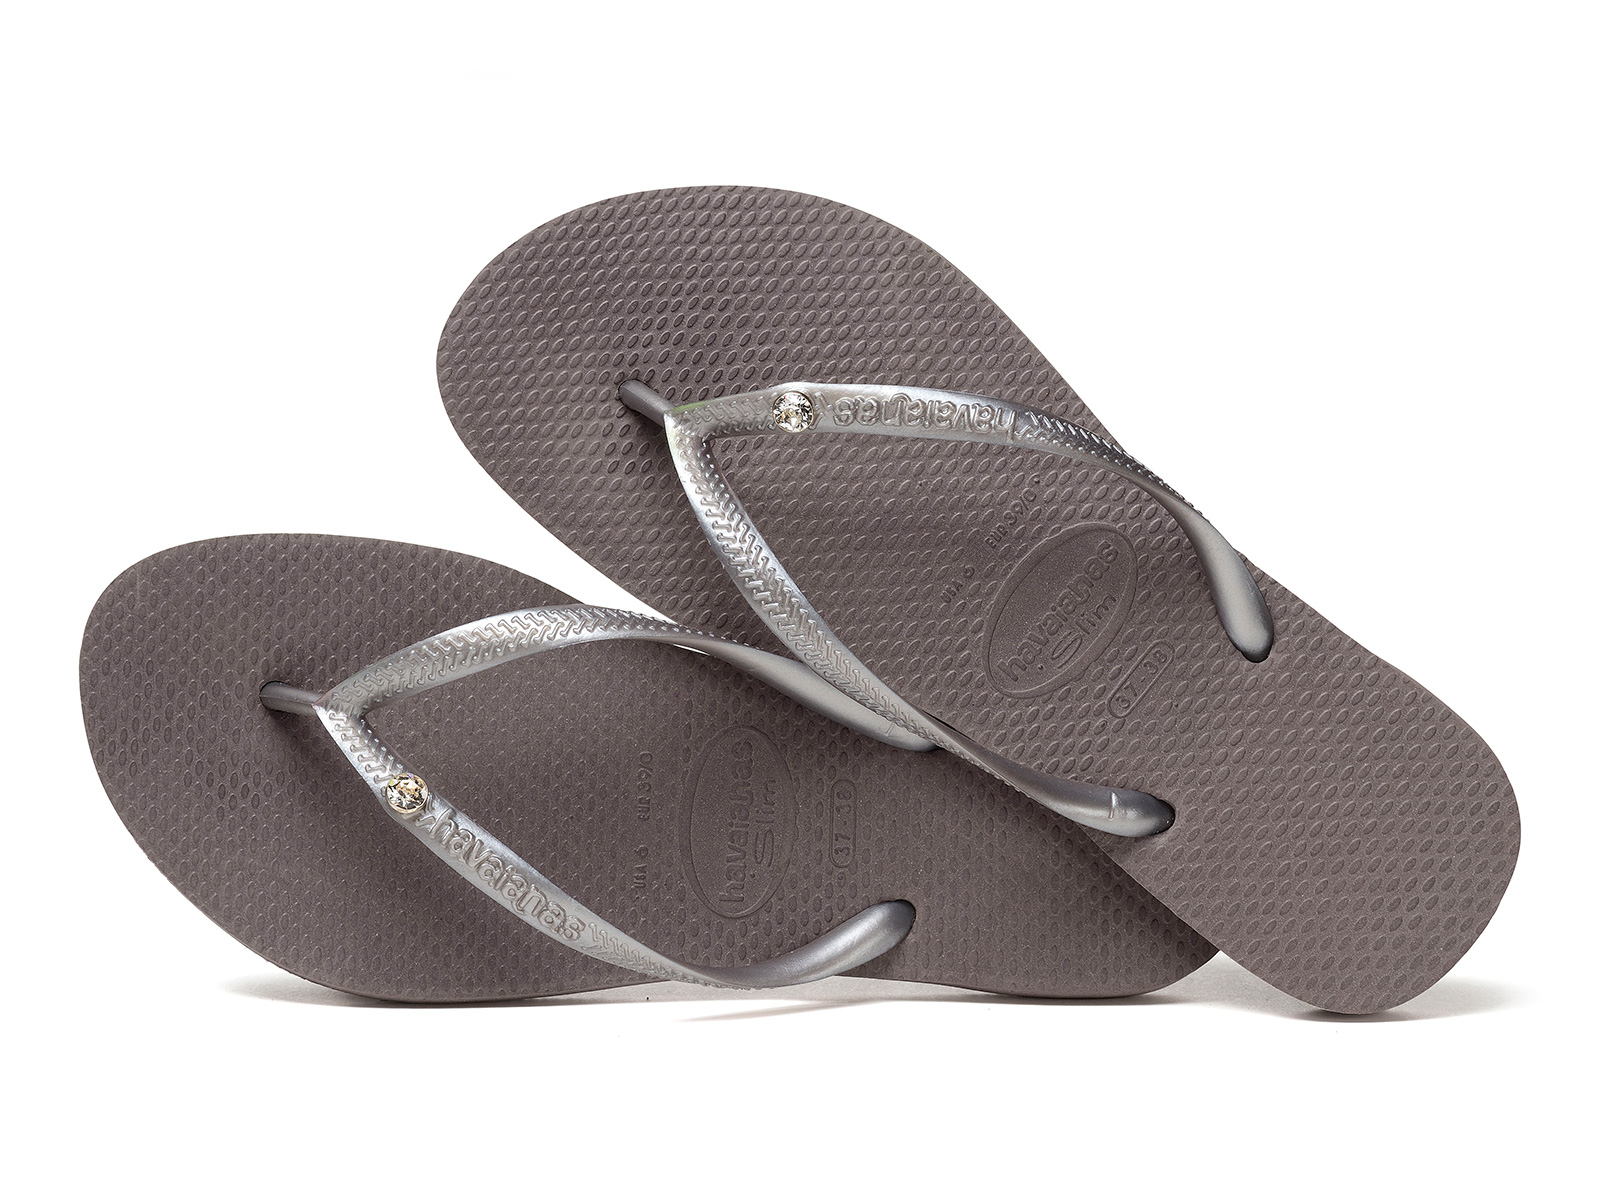 f1811dbfa9c1 Flip-Flops Flip-flops - Havaianas Slim Crystal Glamour Sw Steel Grey